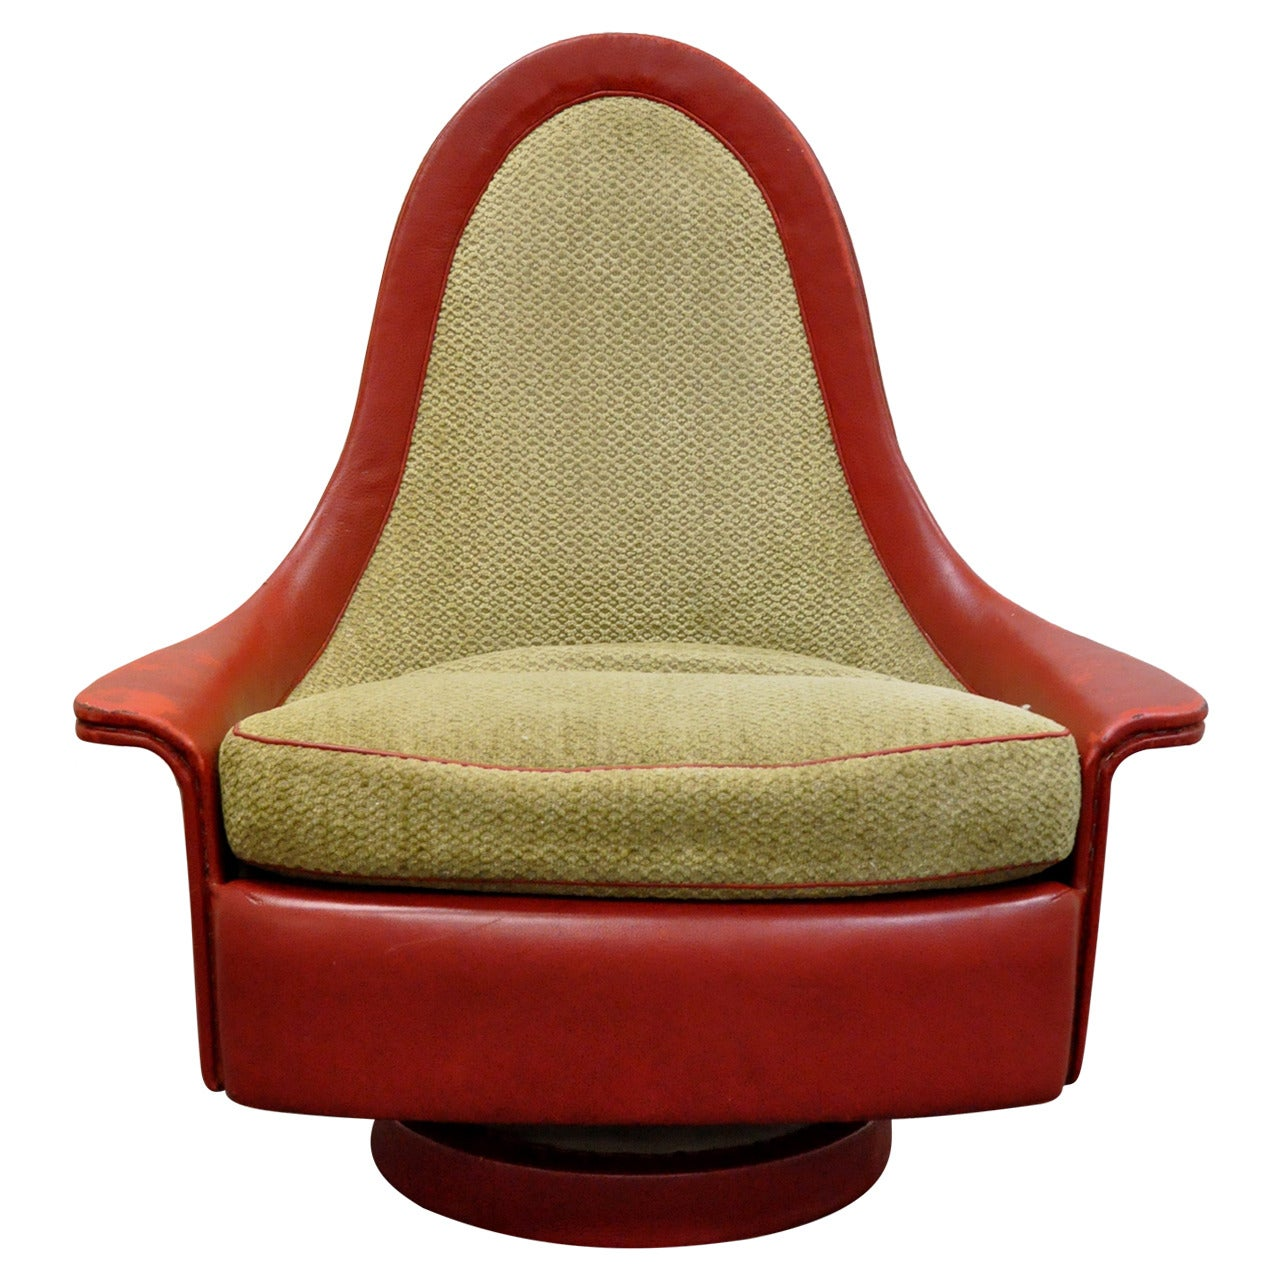 Petite Sculptural Milo Baughman Tear Drop Swivel and Tilt Slipper or Club Chair